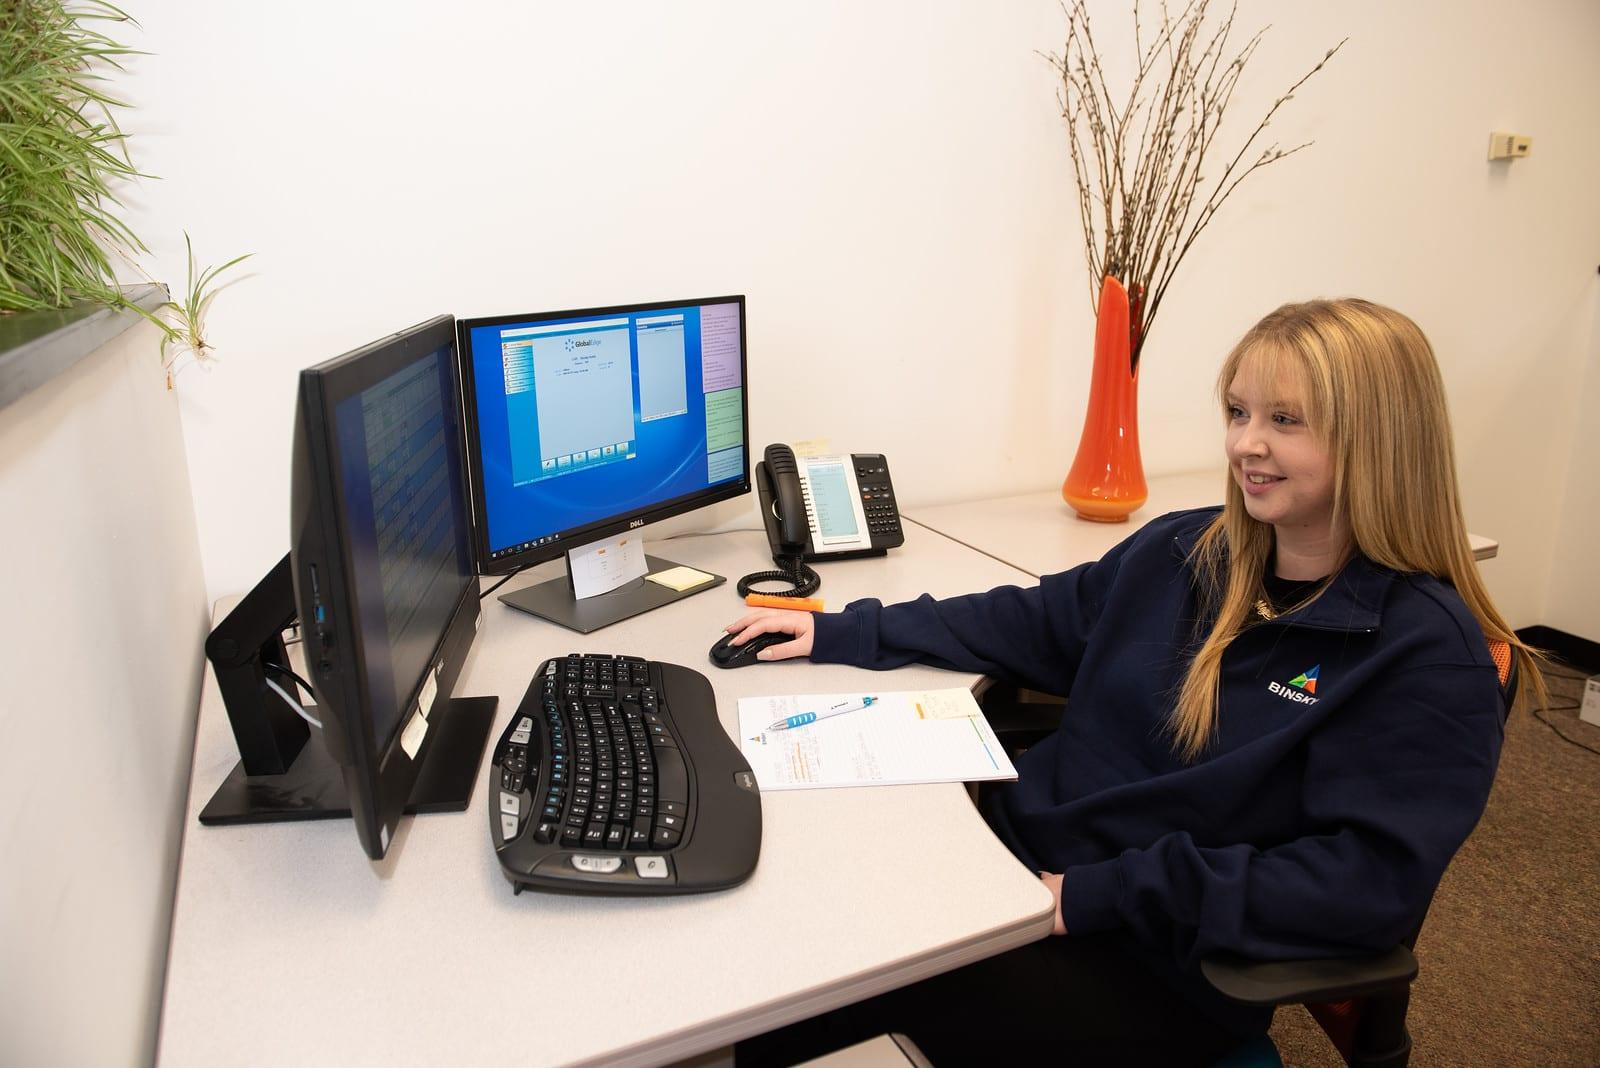 Binsky Customer Service Department